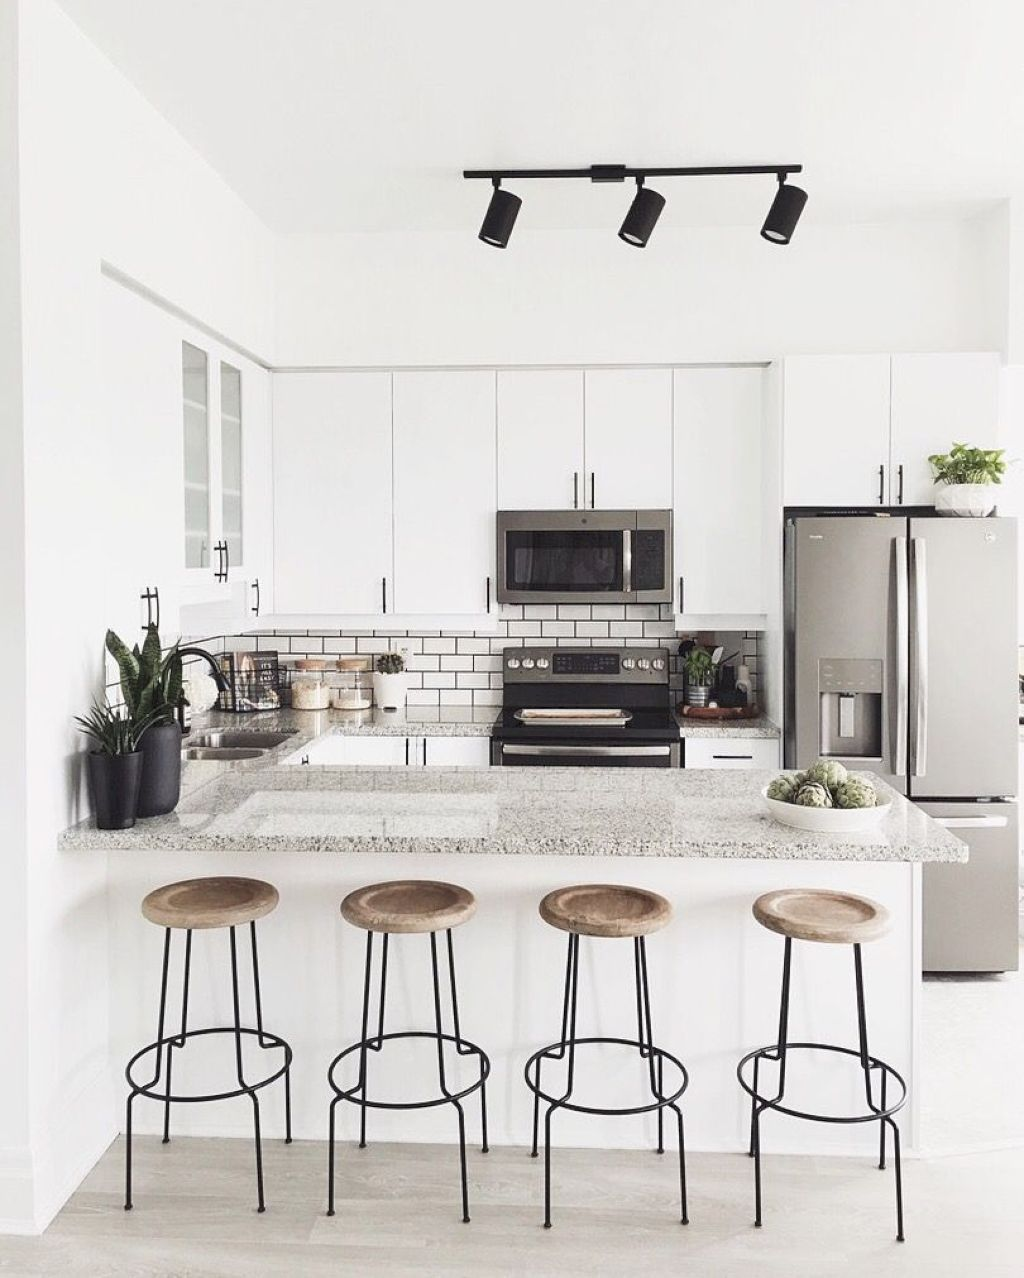 28 Small Kitchen Design Ideas: Gorgeous 55 Awesome Small Apartment Kitchen Remodel Ideas